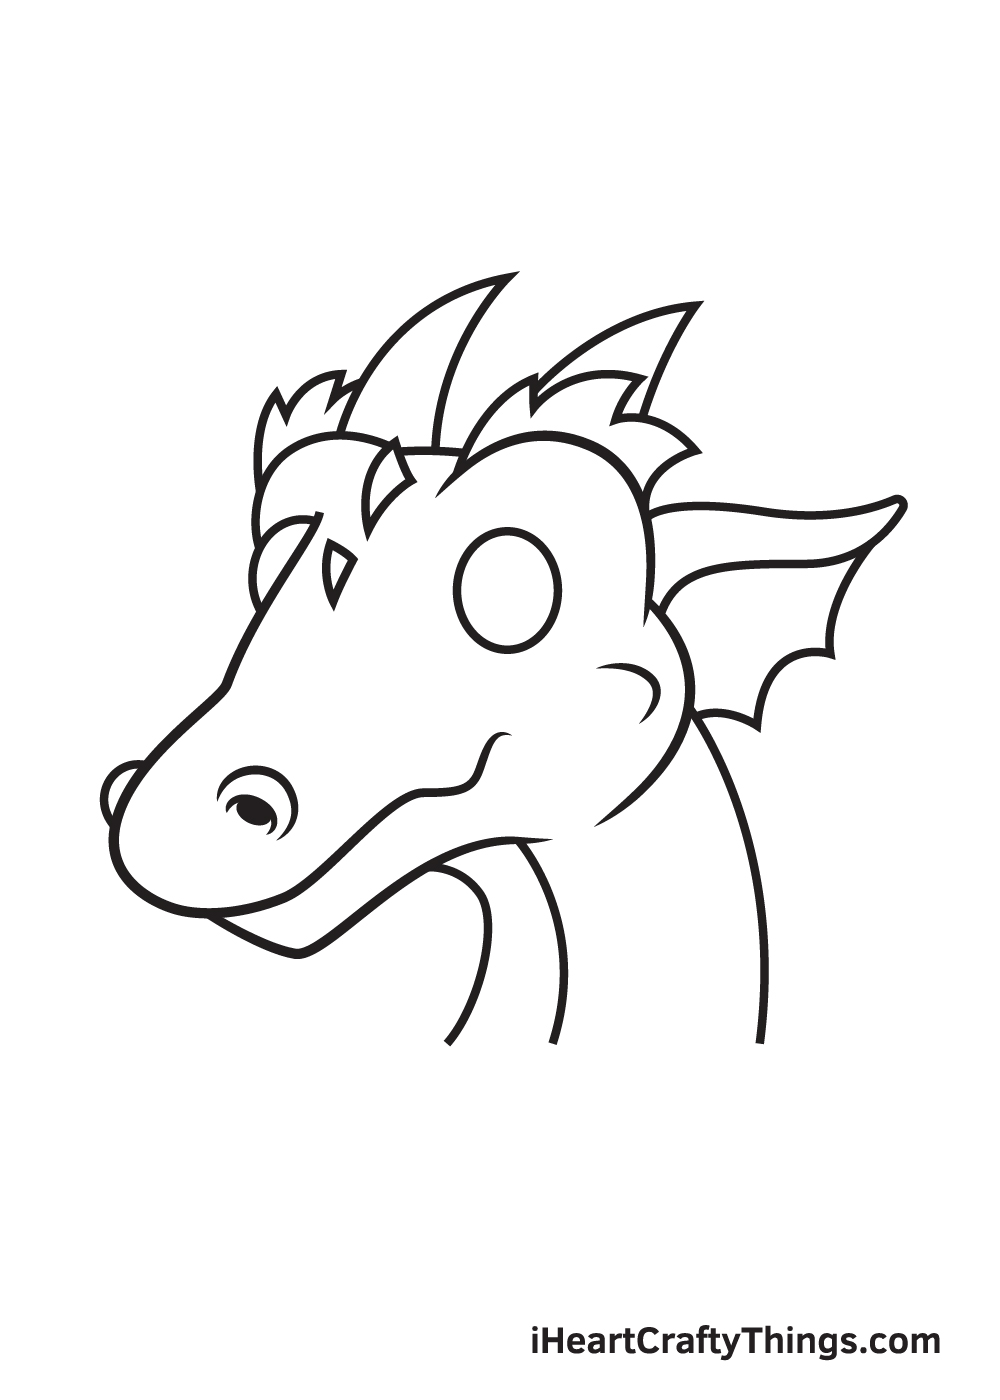 dragon head drawing - step 8